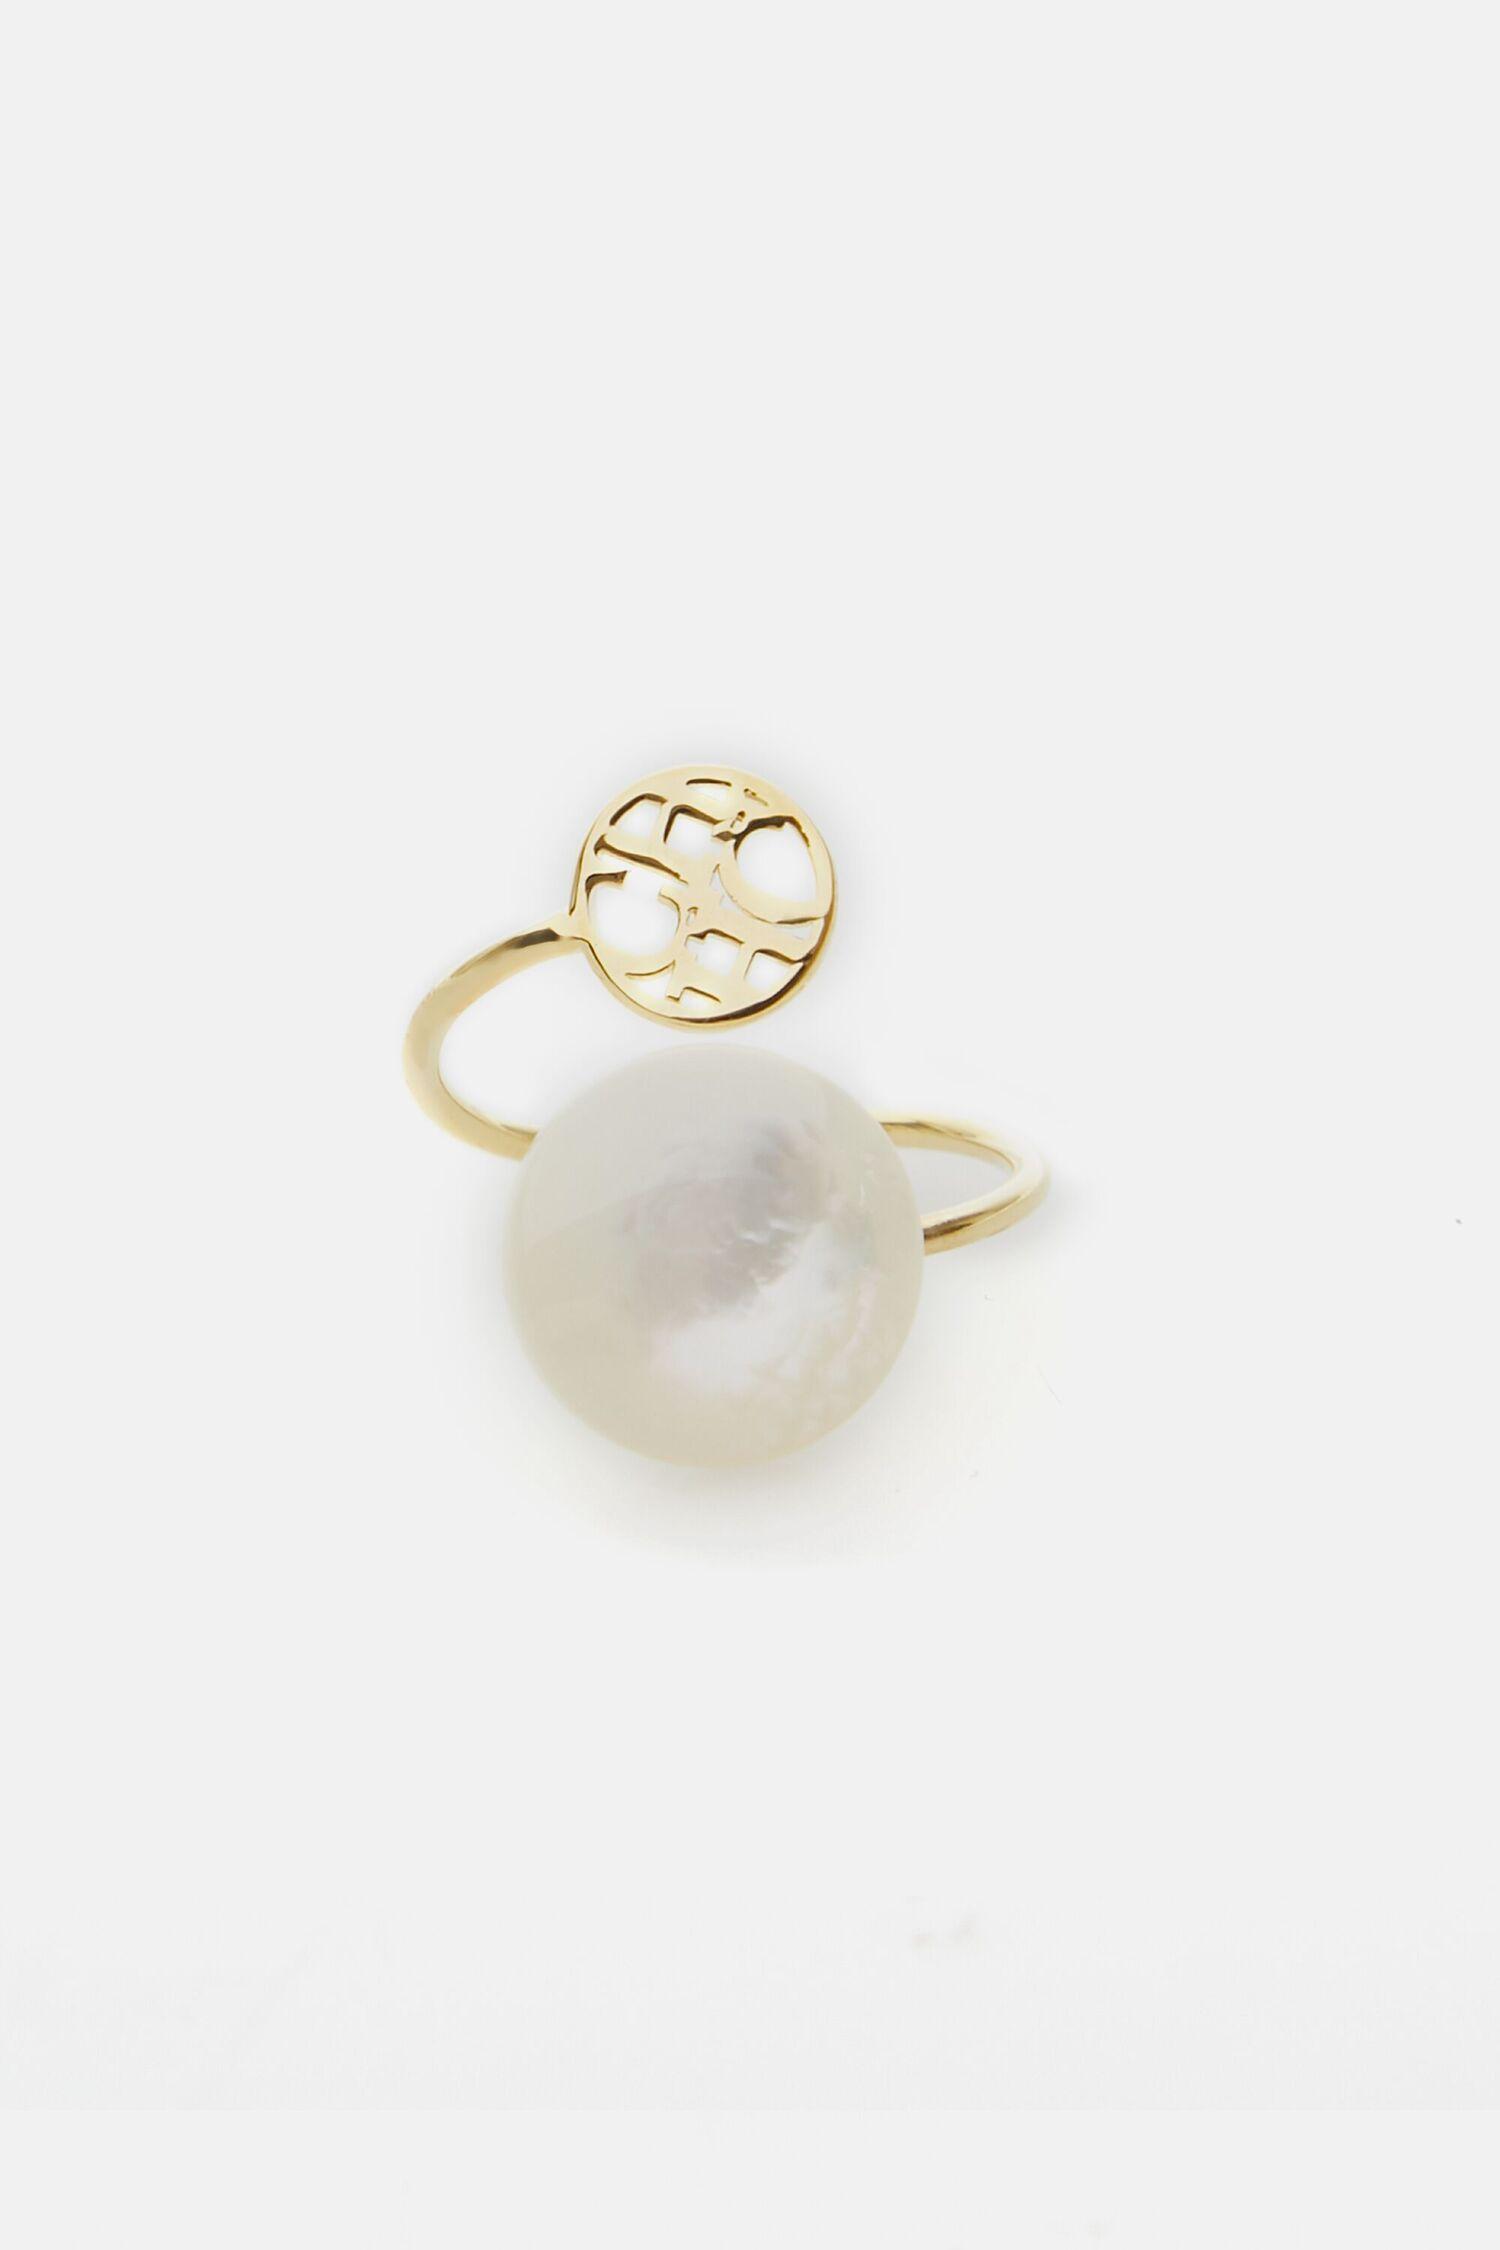 CH Moon ring